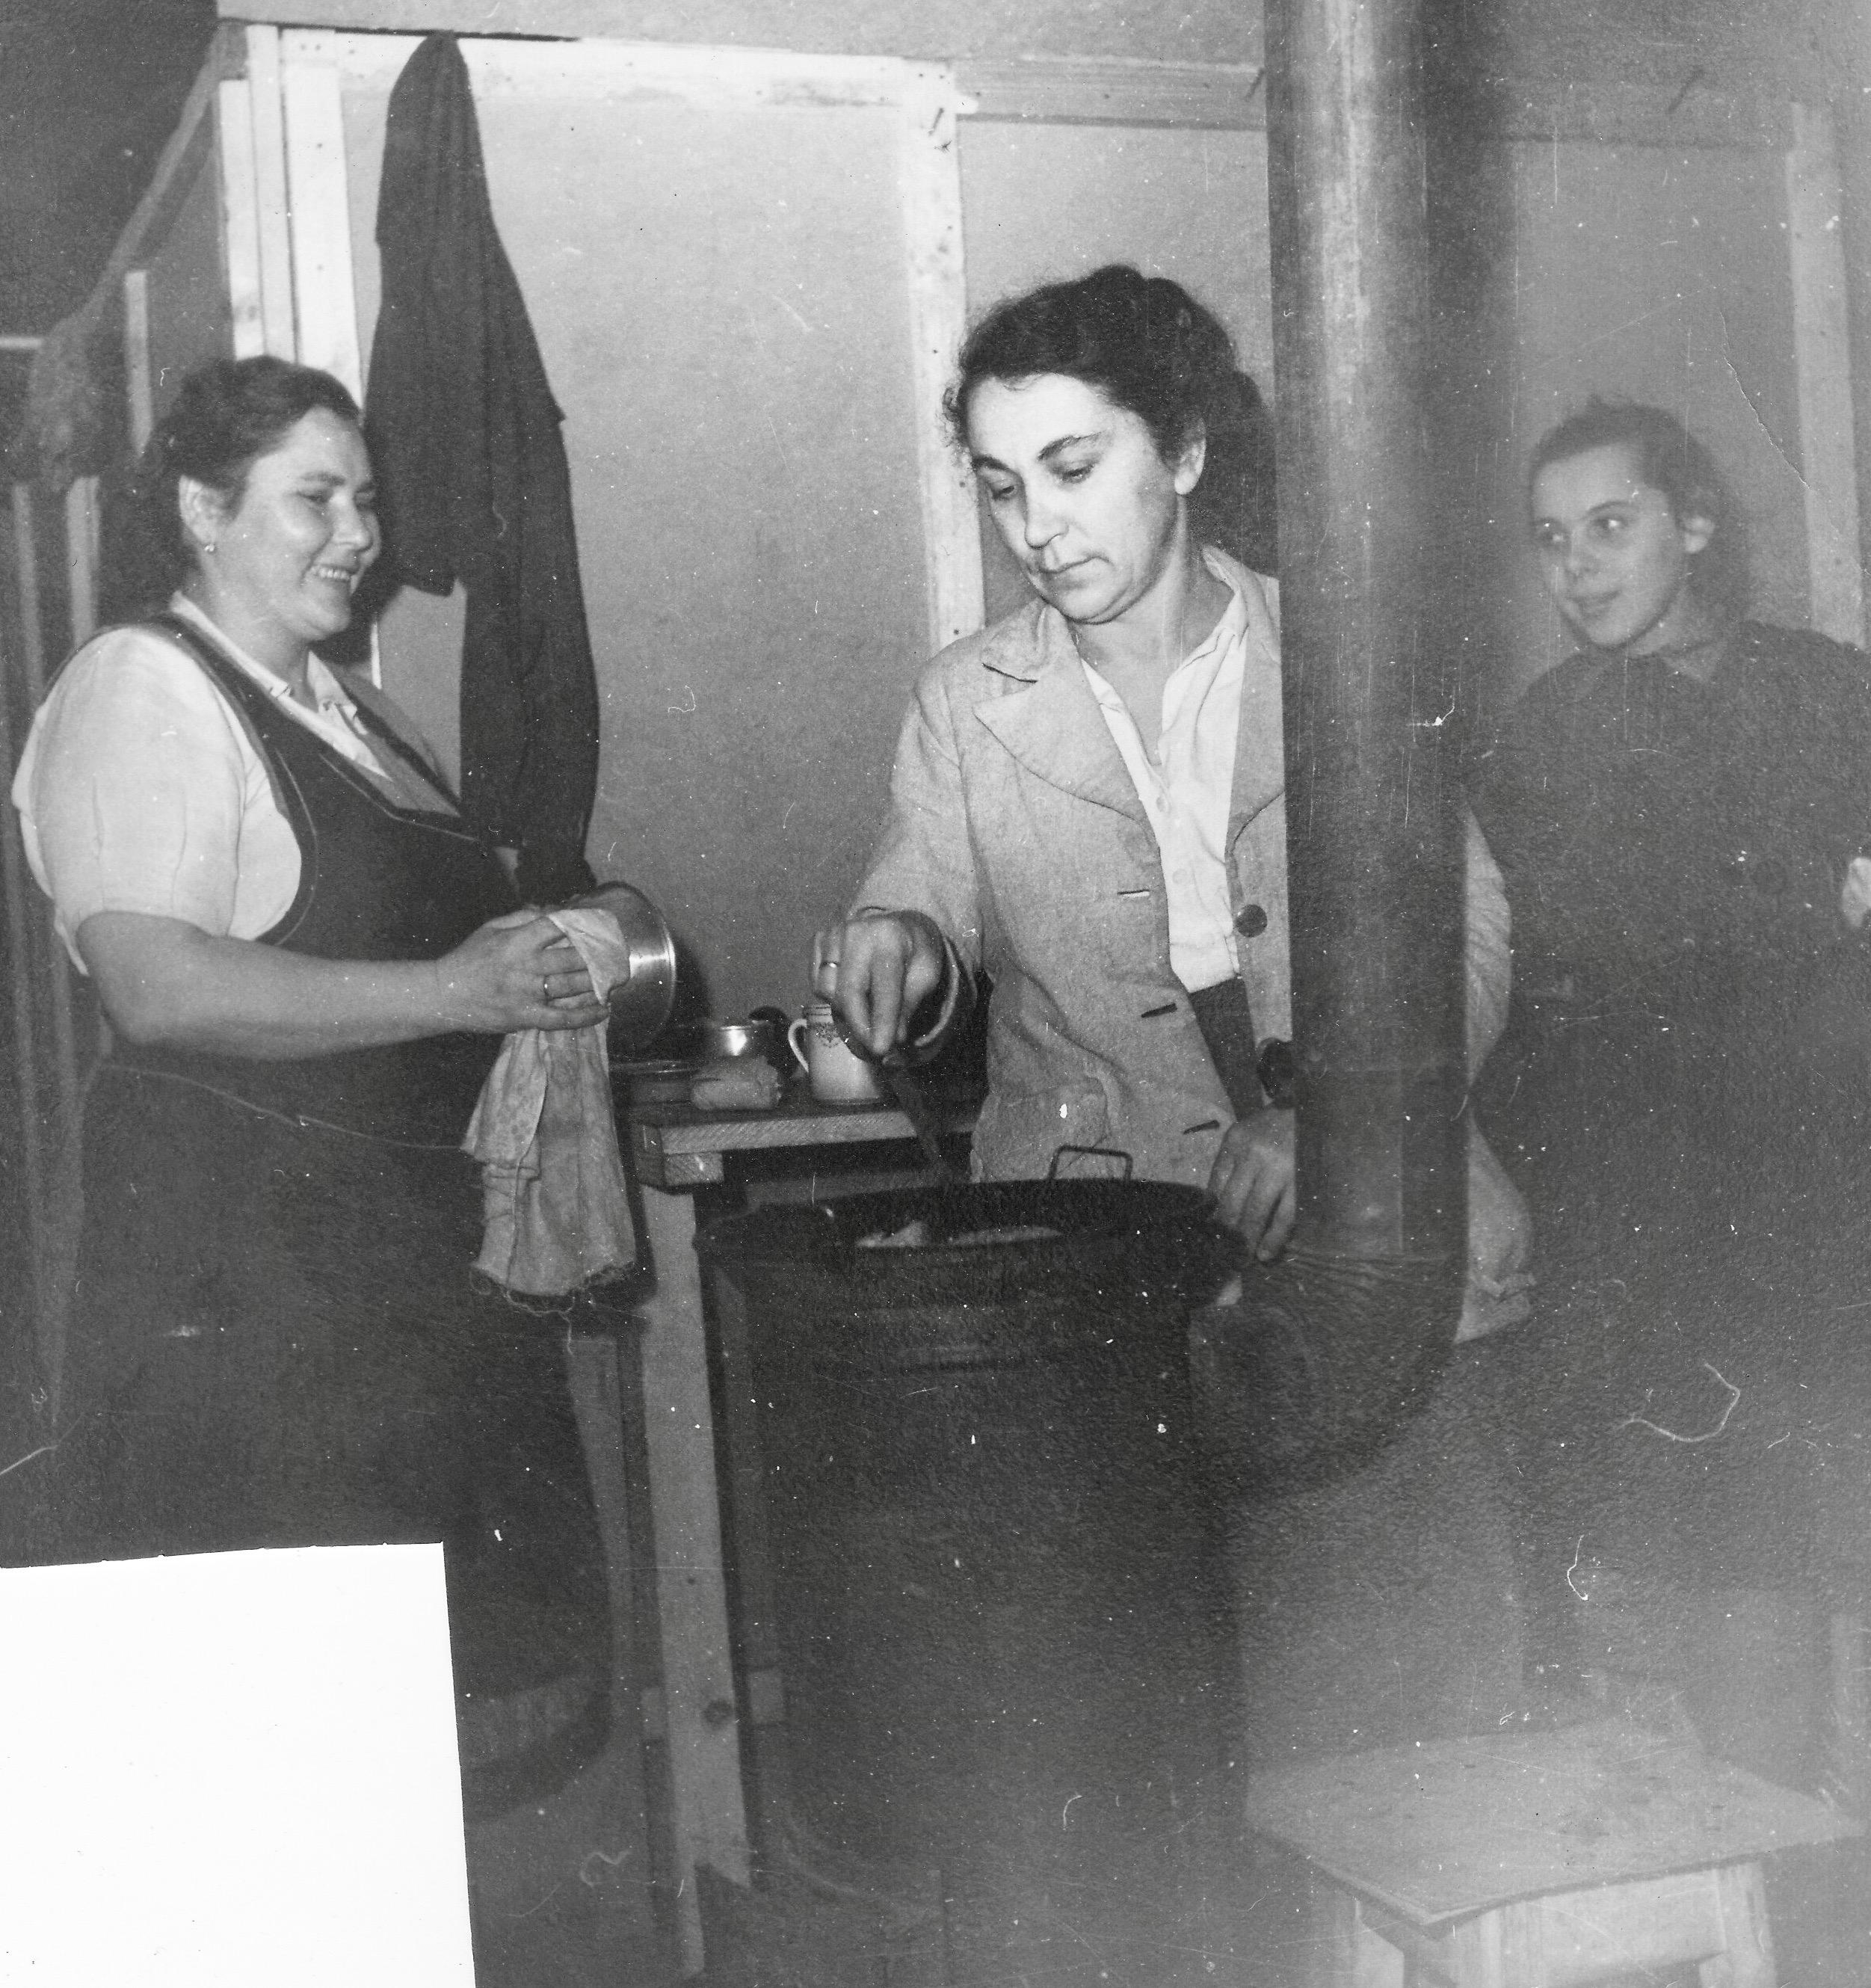 San Sabba barracks, cooking in the corridor 1950-51